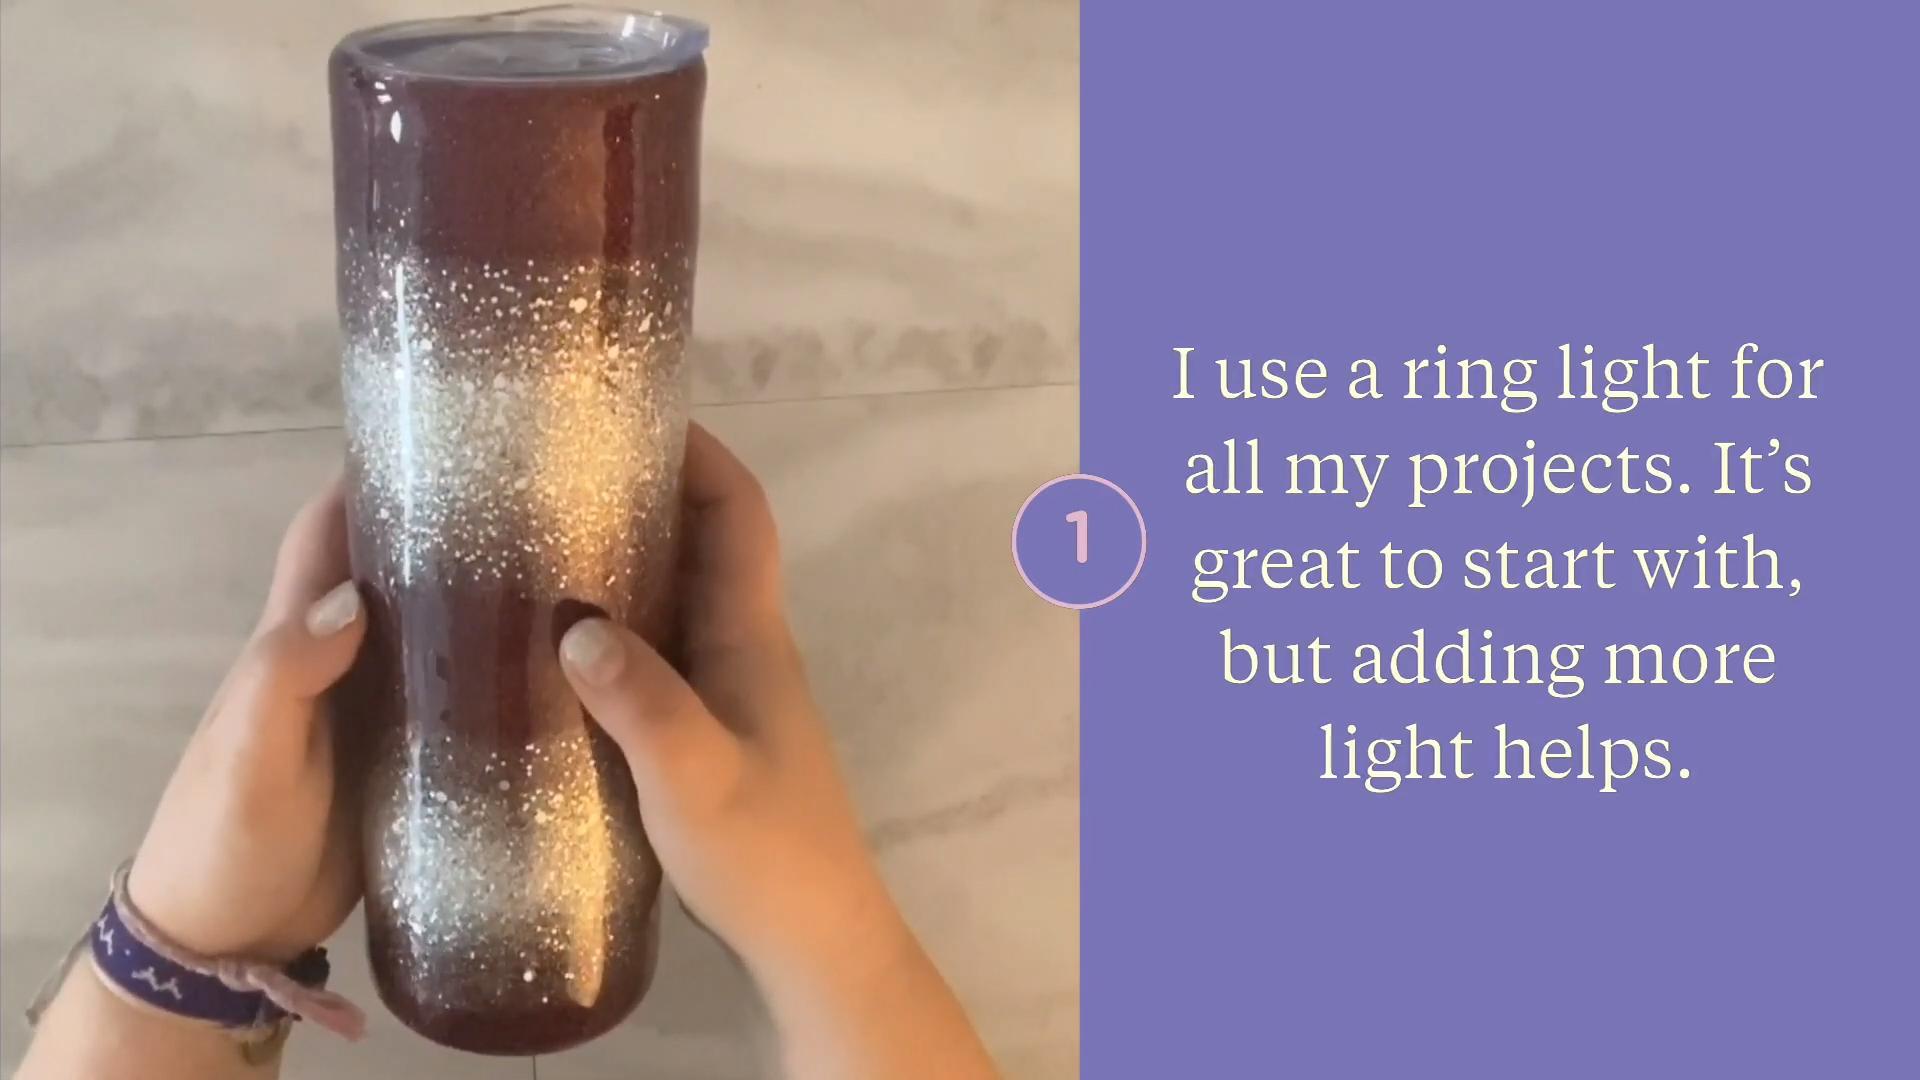 Use a ring light for good lighting beginner lighting tips for photo and video